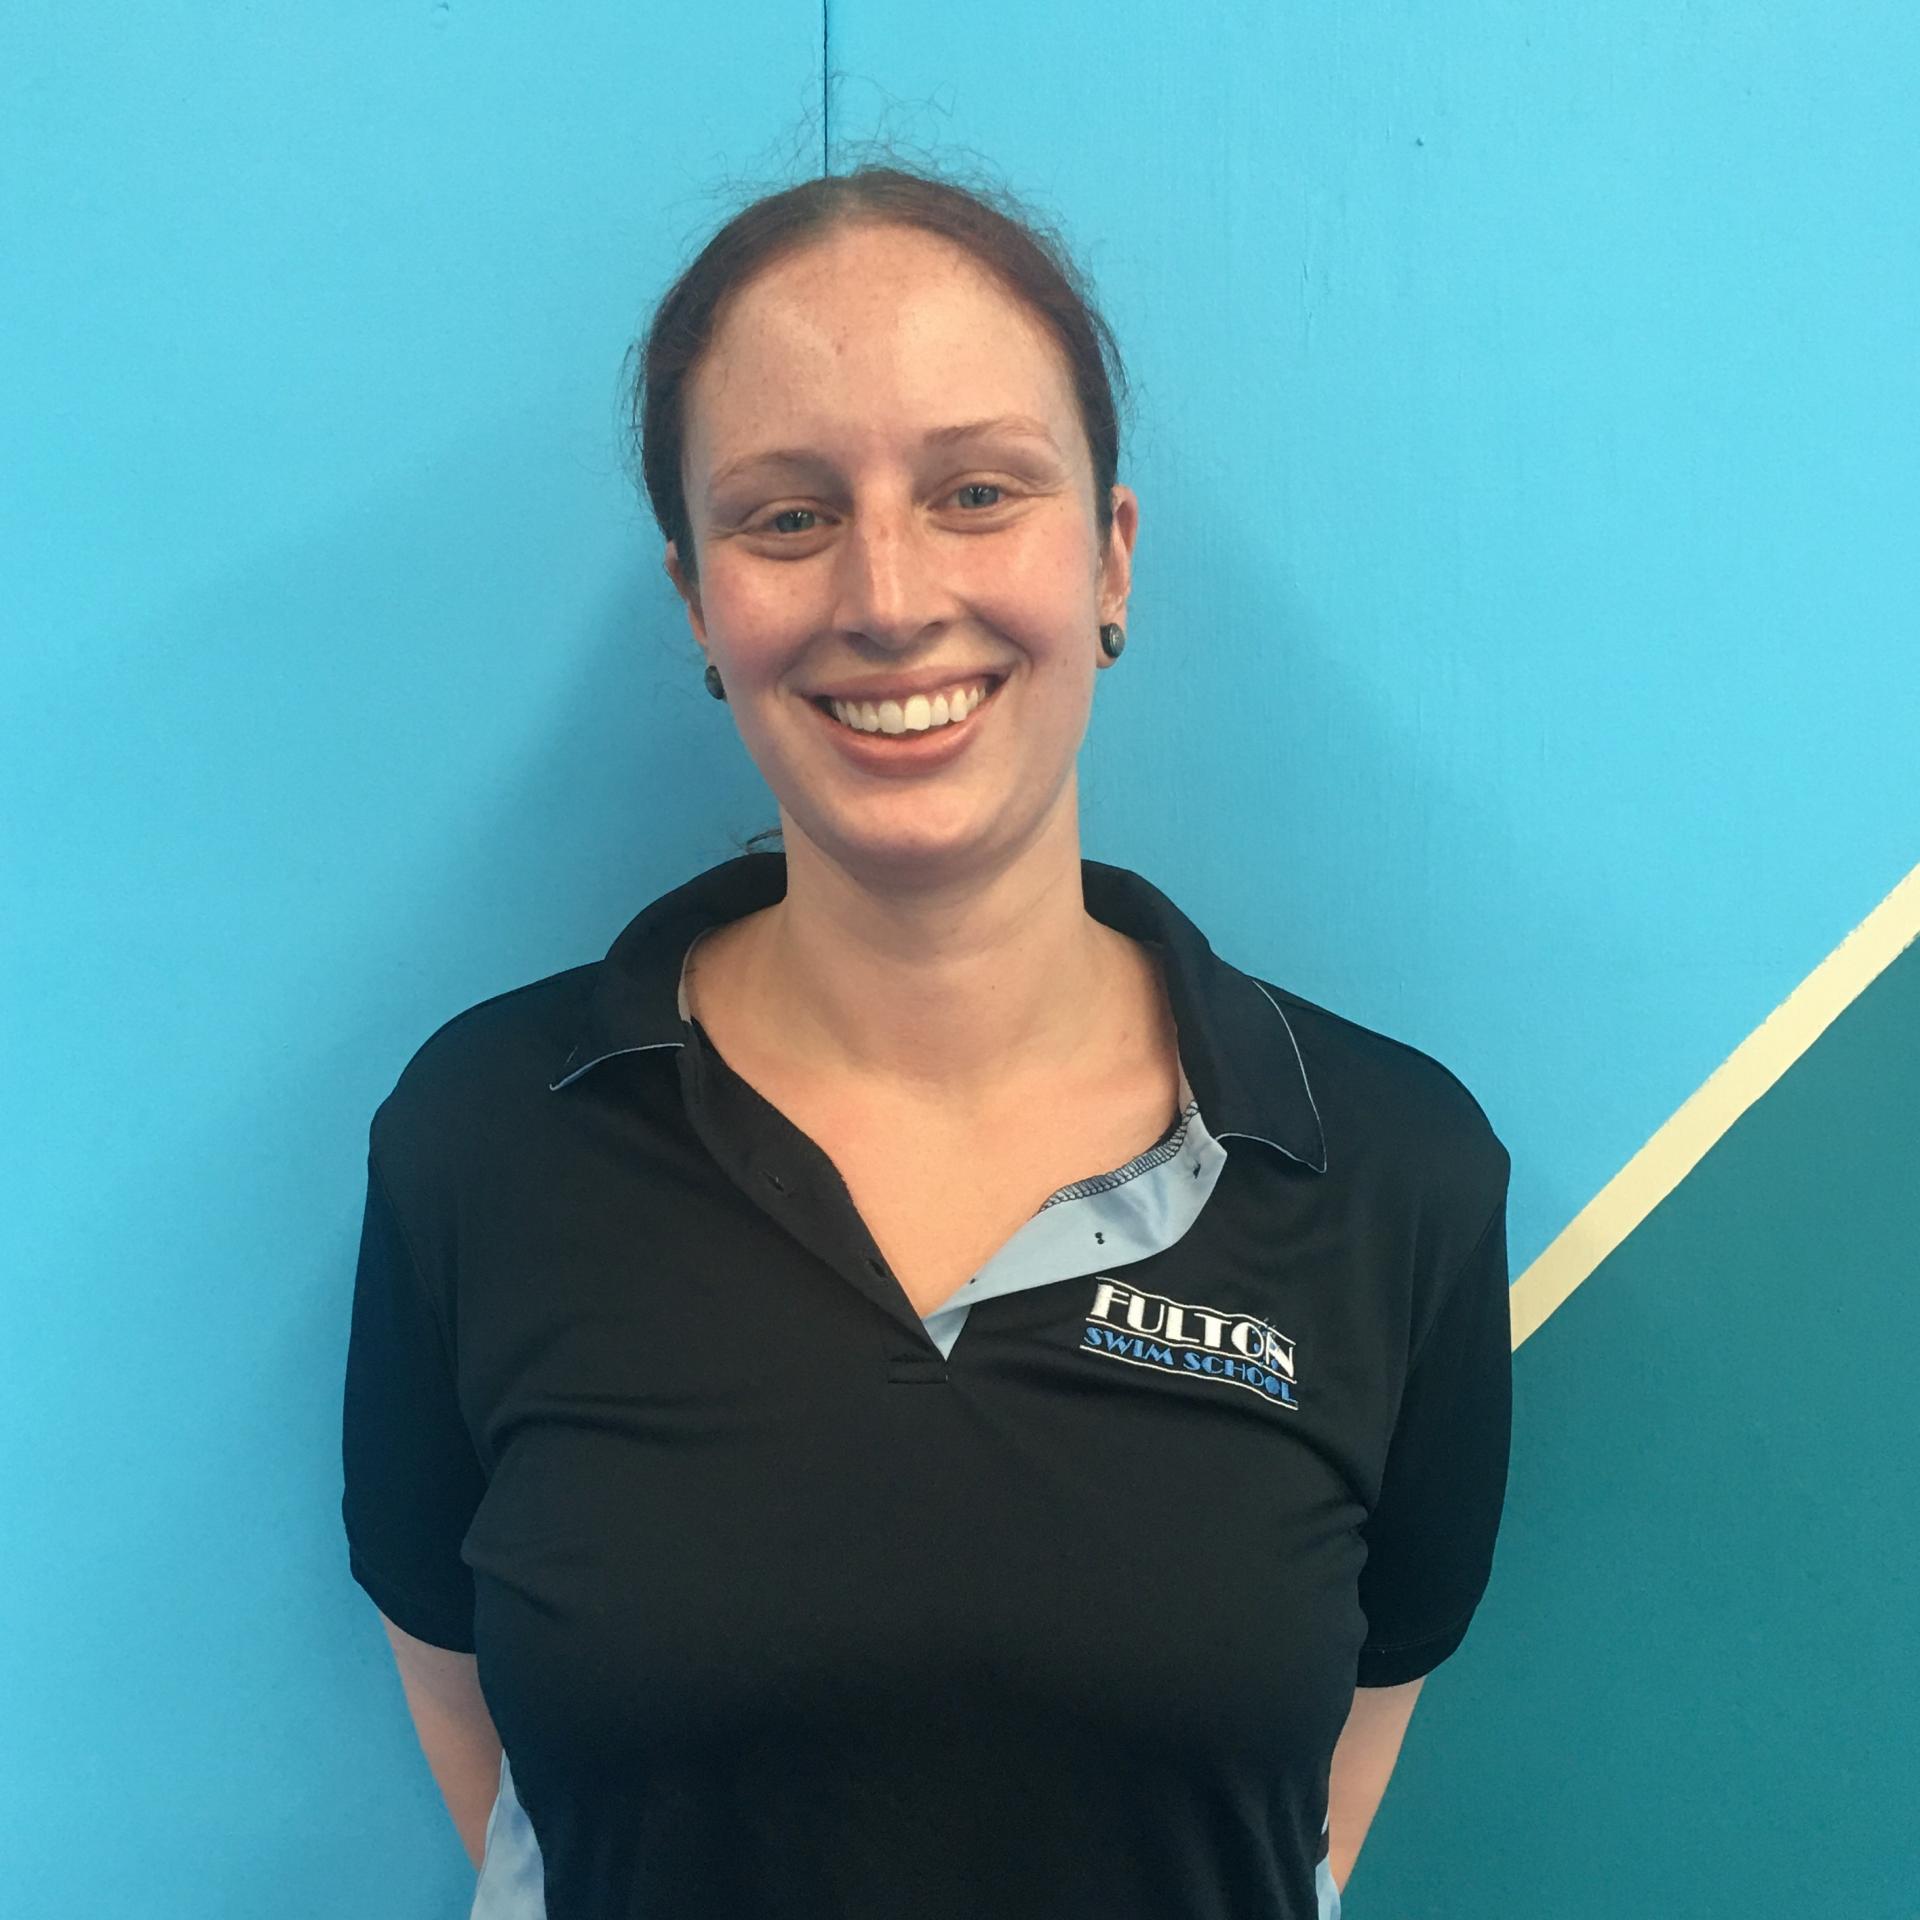 Mary - Fulton Swim School Teacher